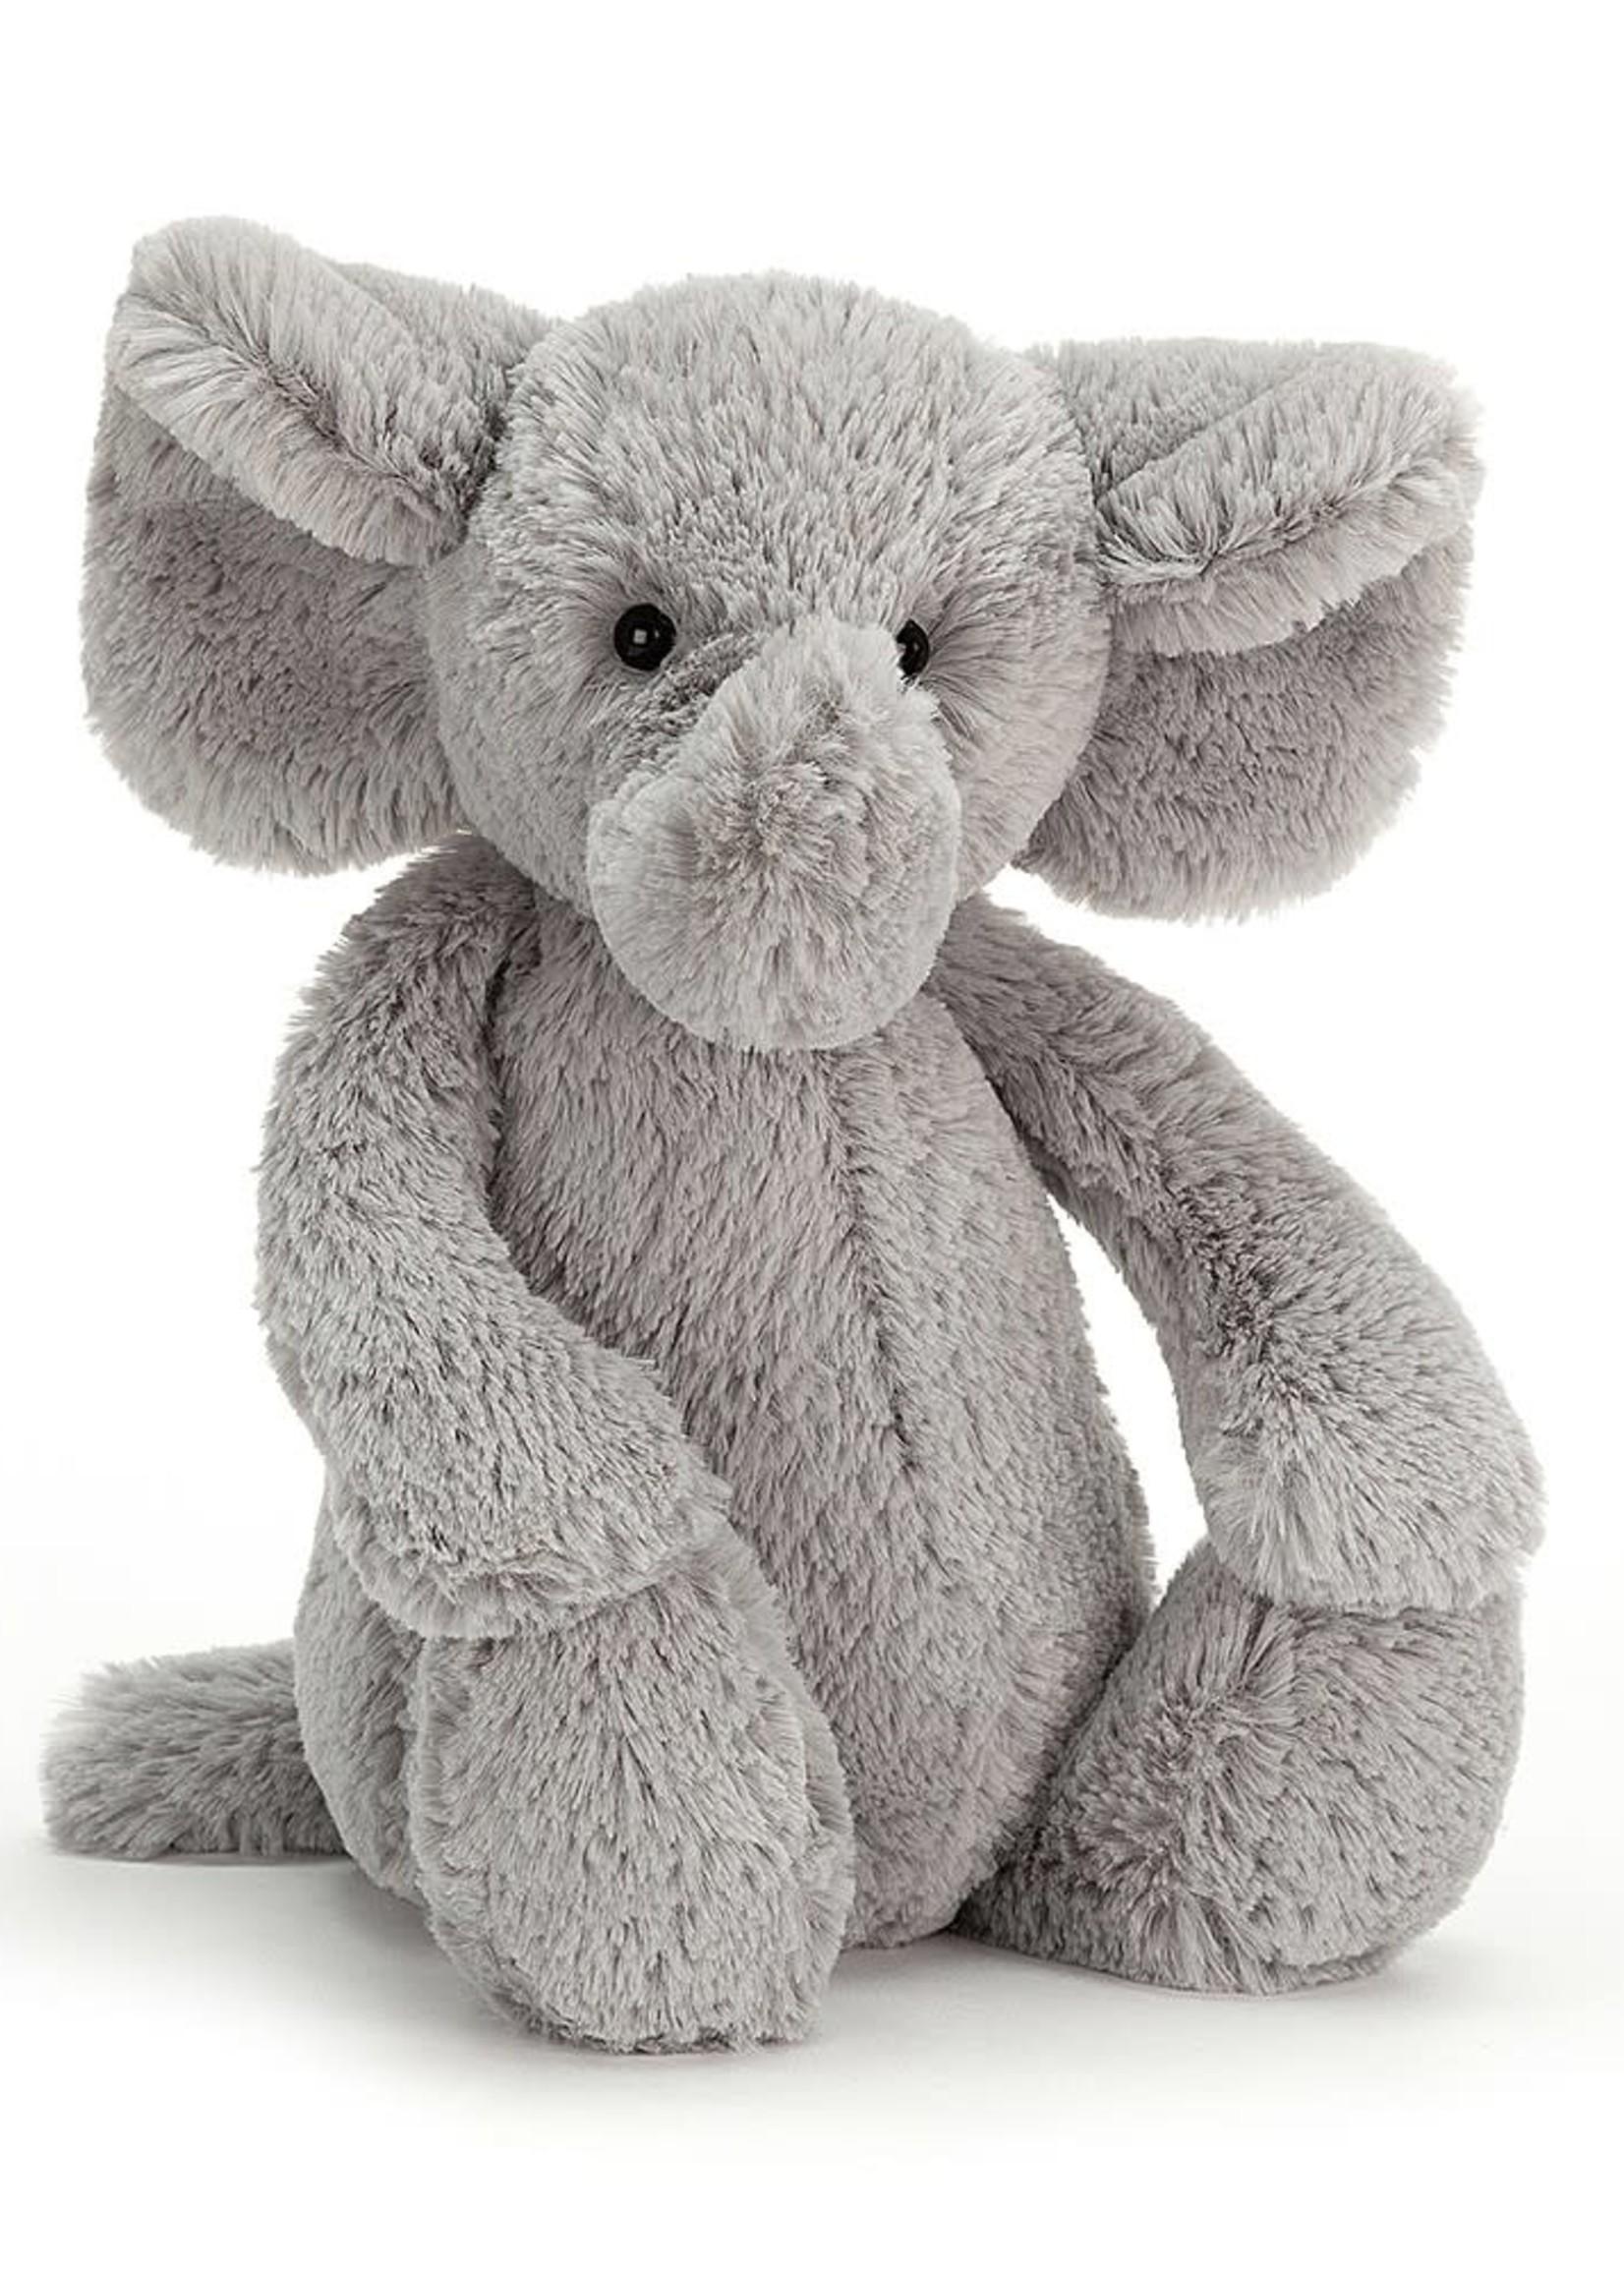 JELLYCAT JELLYCAT SMALL BASHFUL GREY ELEPHANT